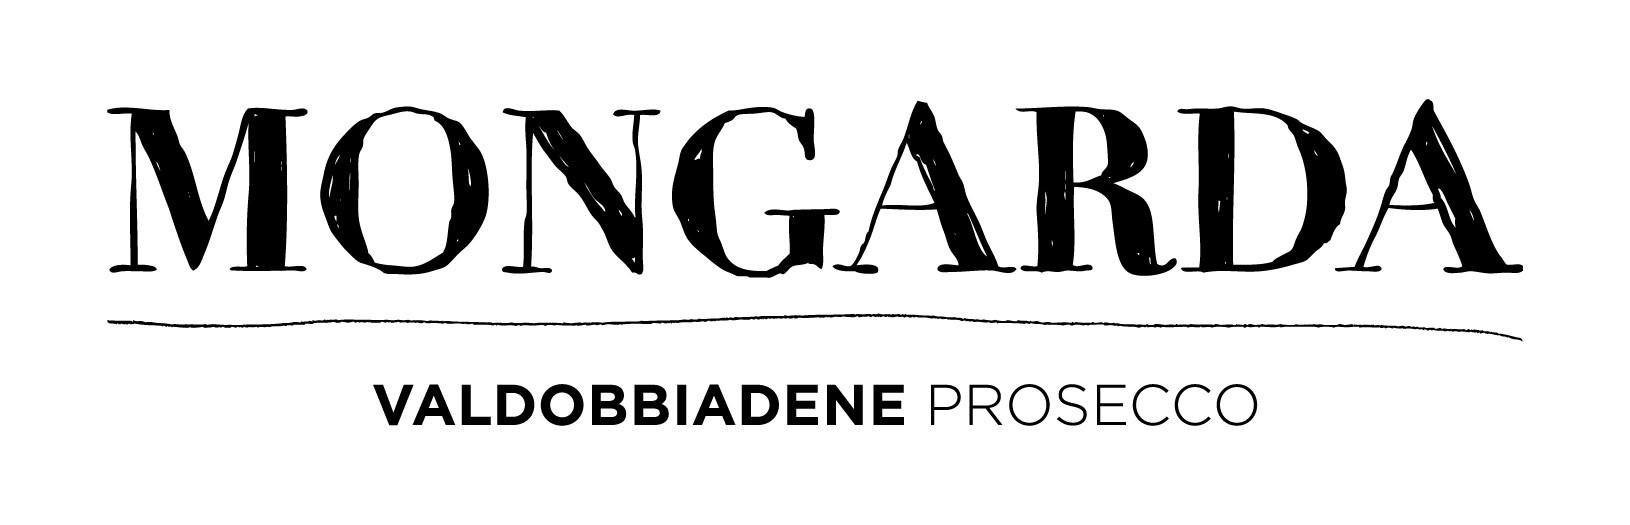 MONGARDA